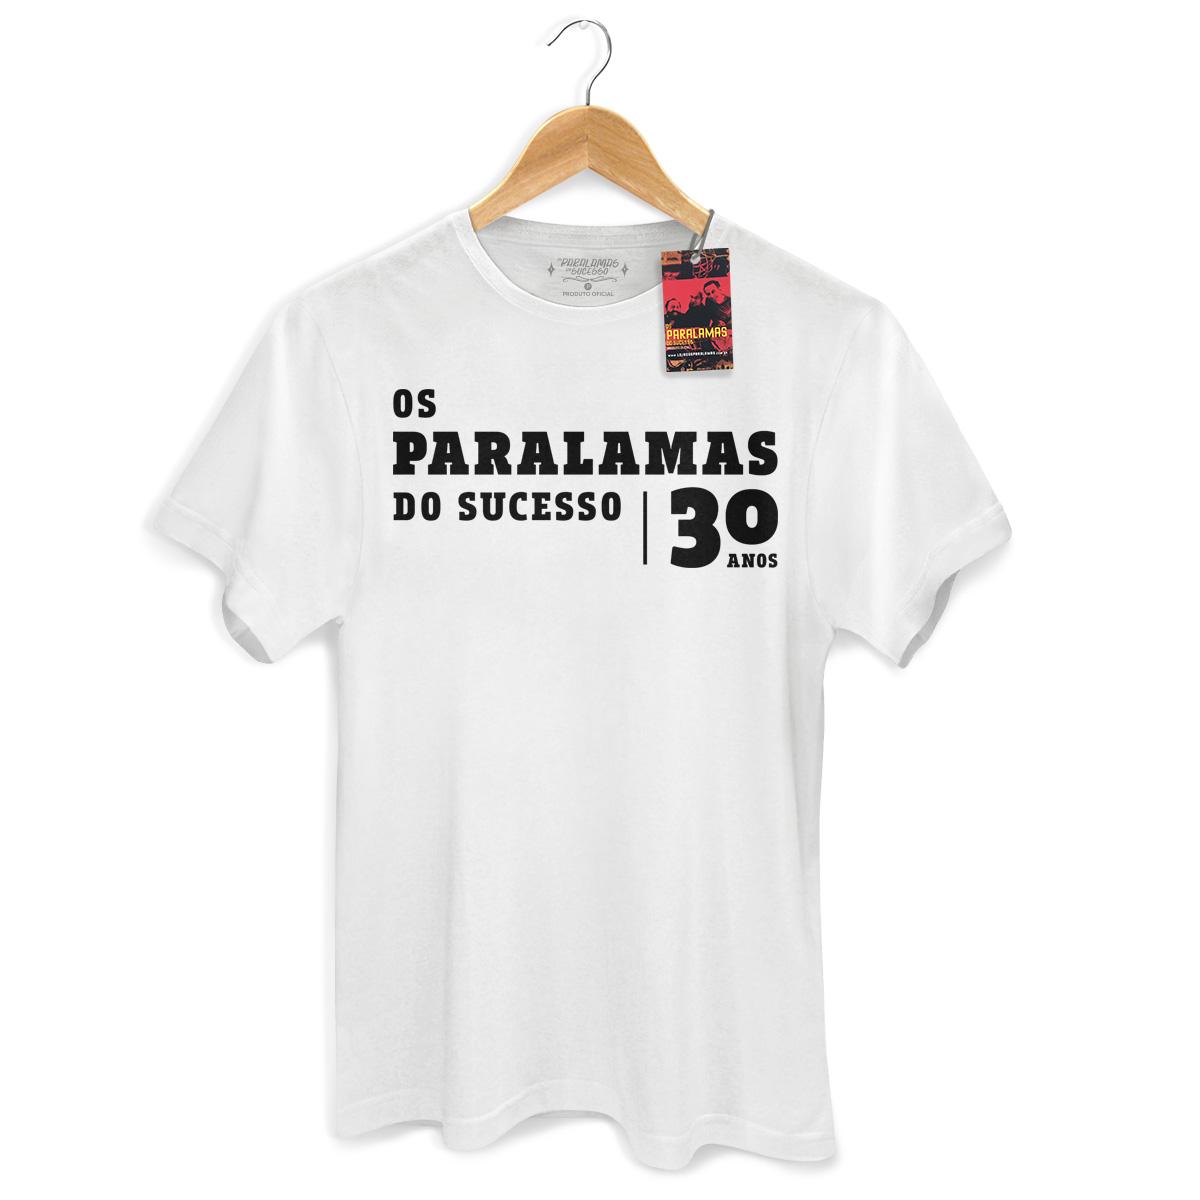 Camiseta Masculina Paralamas do Sucesso 30 Anos Modelo 2